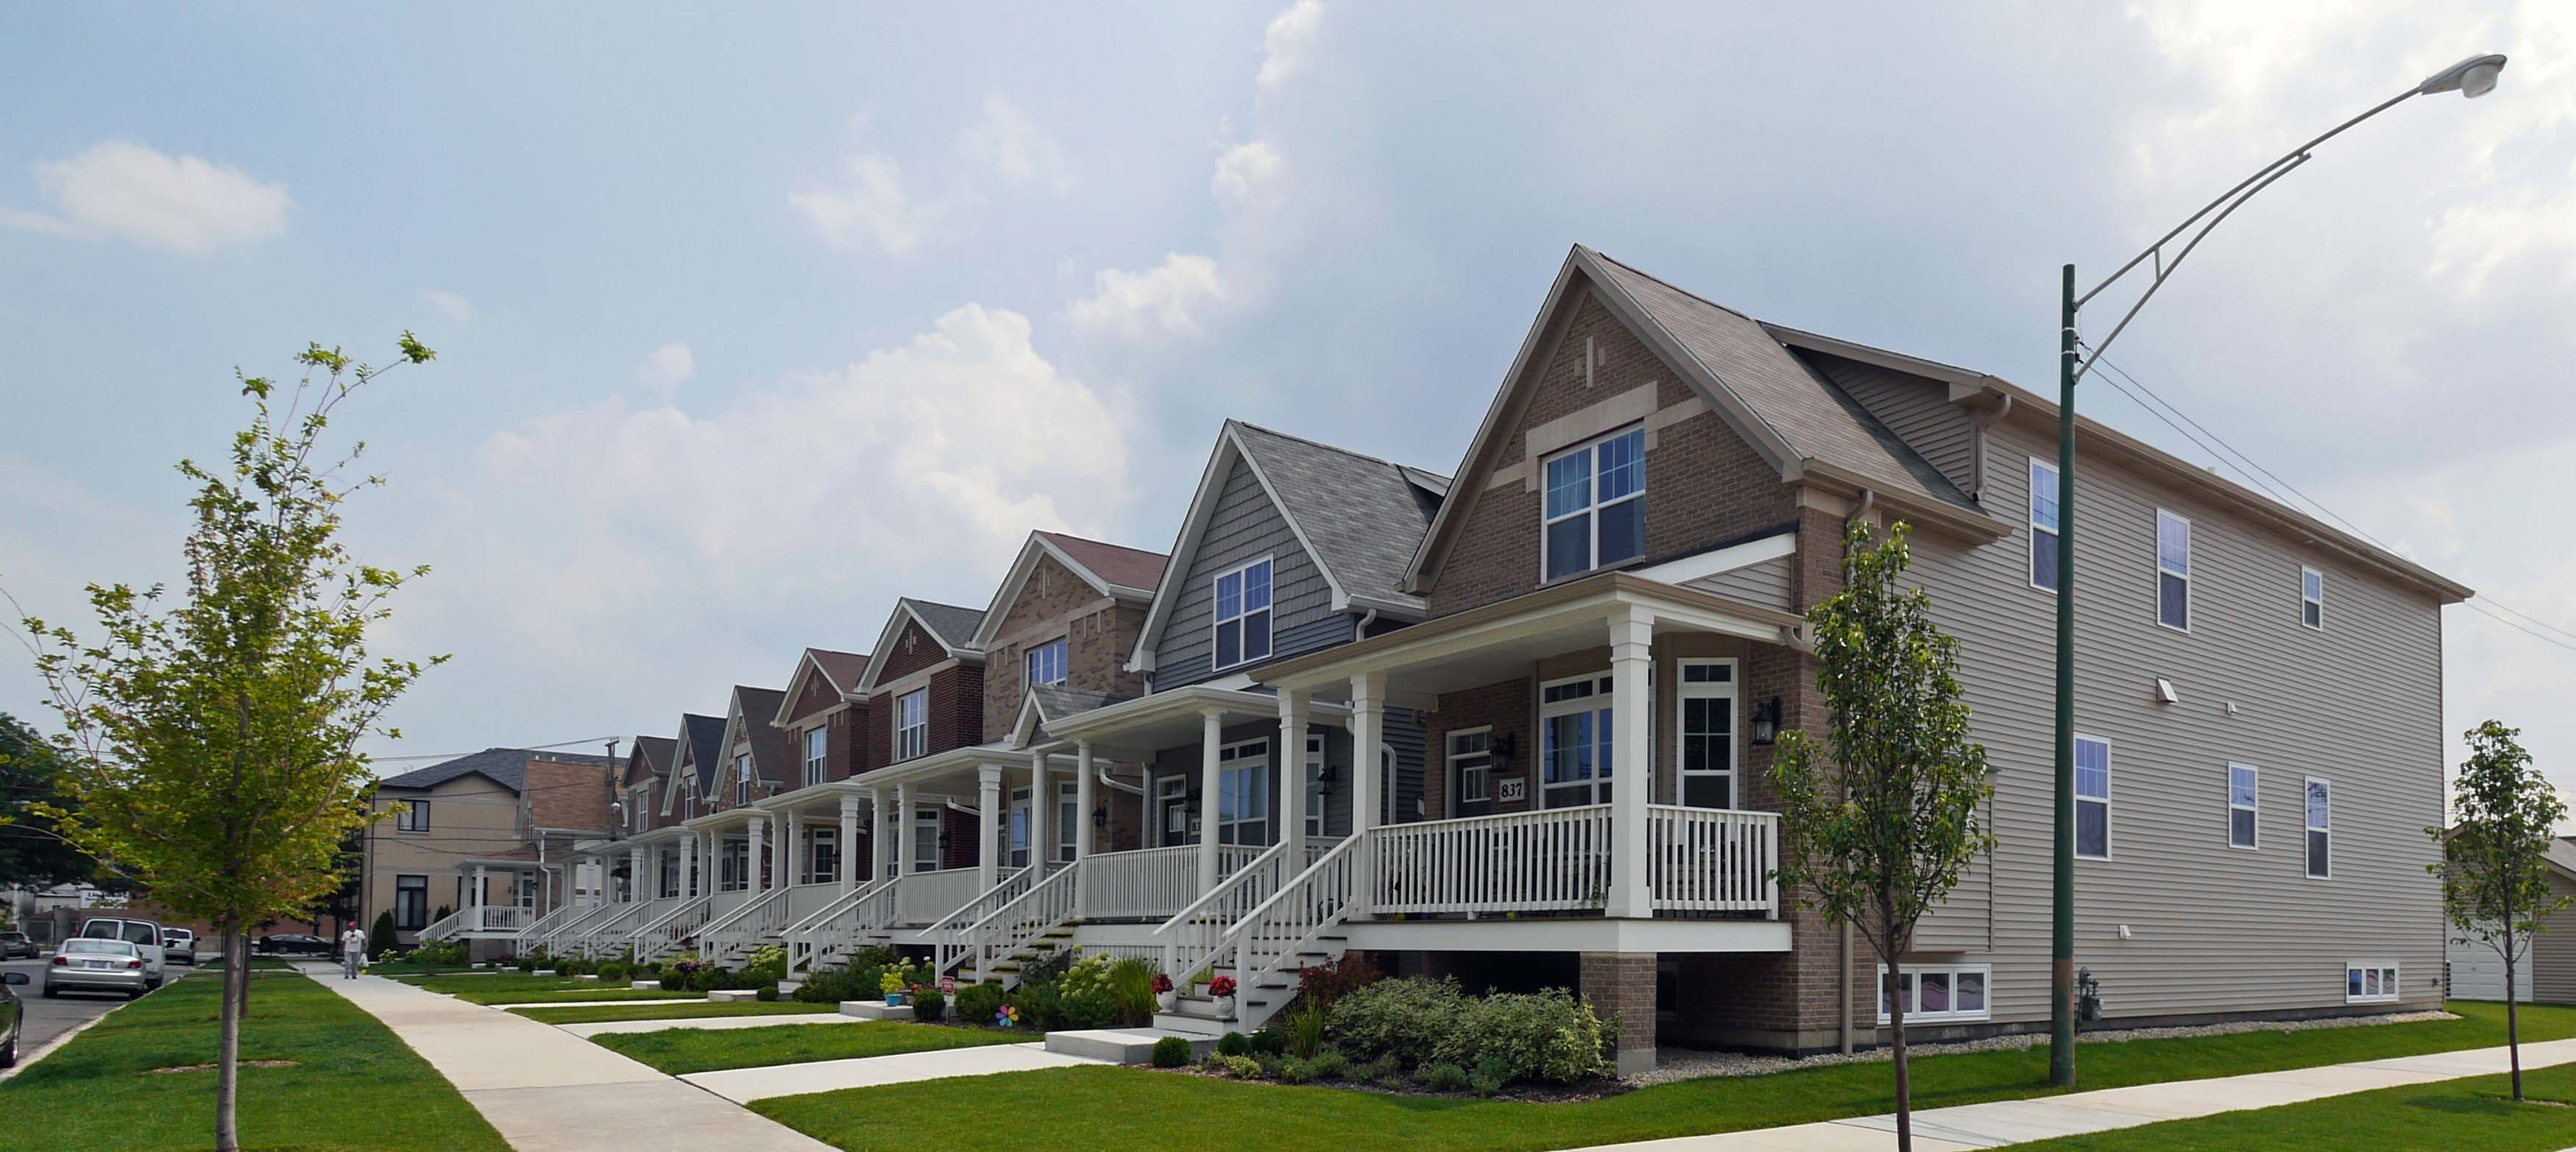 Classic Single Family Homes Near Donovan Park In Bridgeport YoChicago